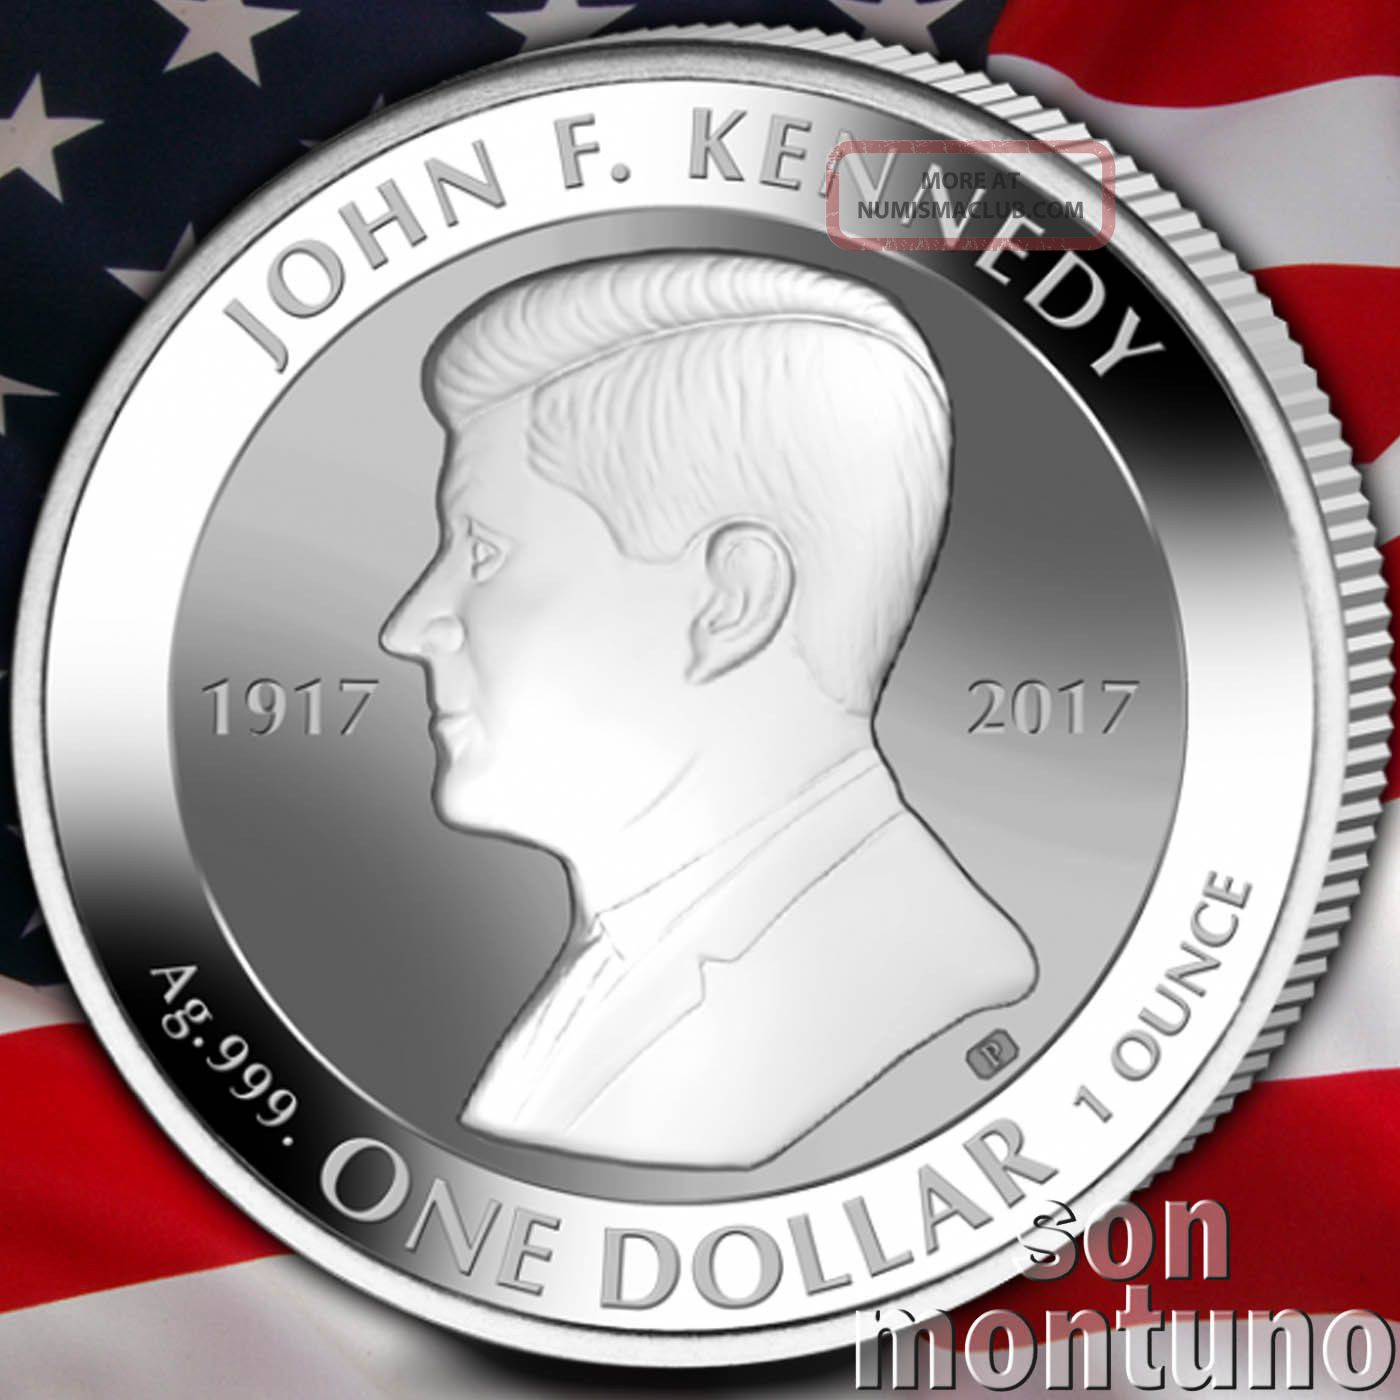 John F Kennedy - 1 Oz Silver Coin Reverse Proof - 2017 British Virgin Islands $1 Coins: World photo